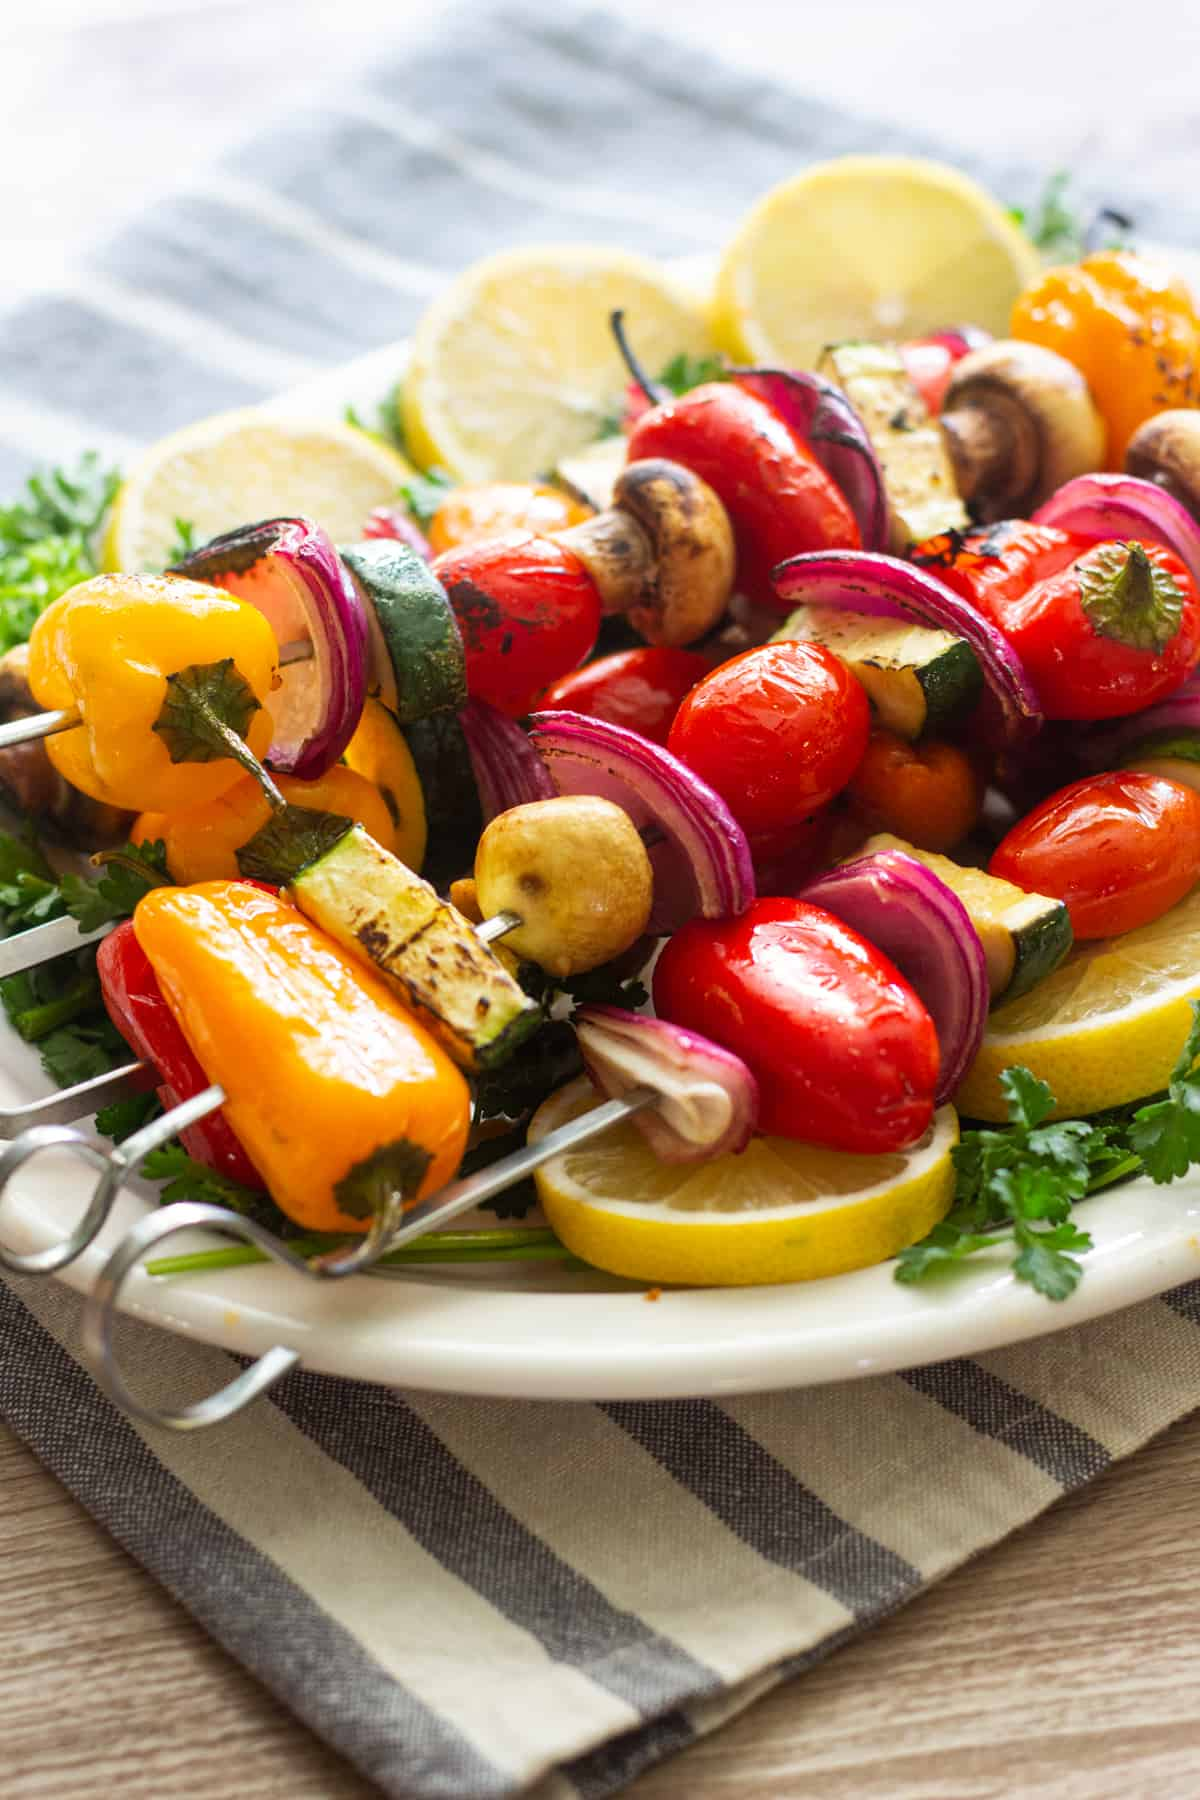 veggie shish kabob is a great side dish.